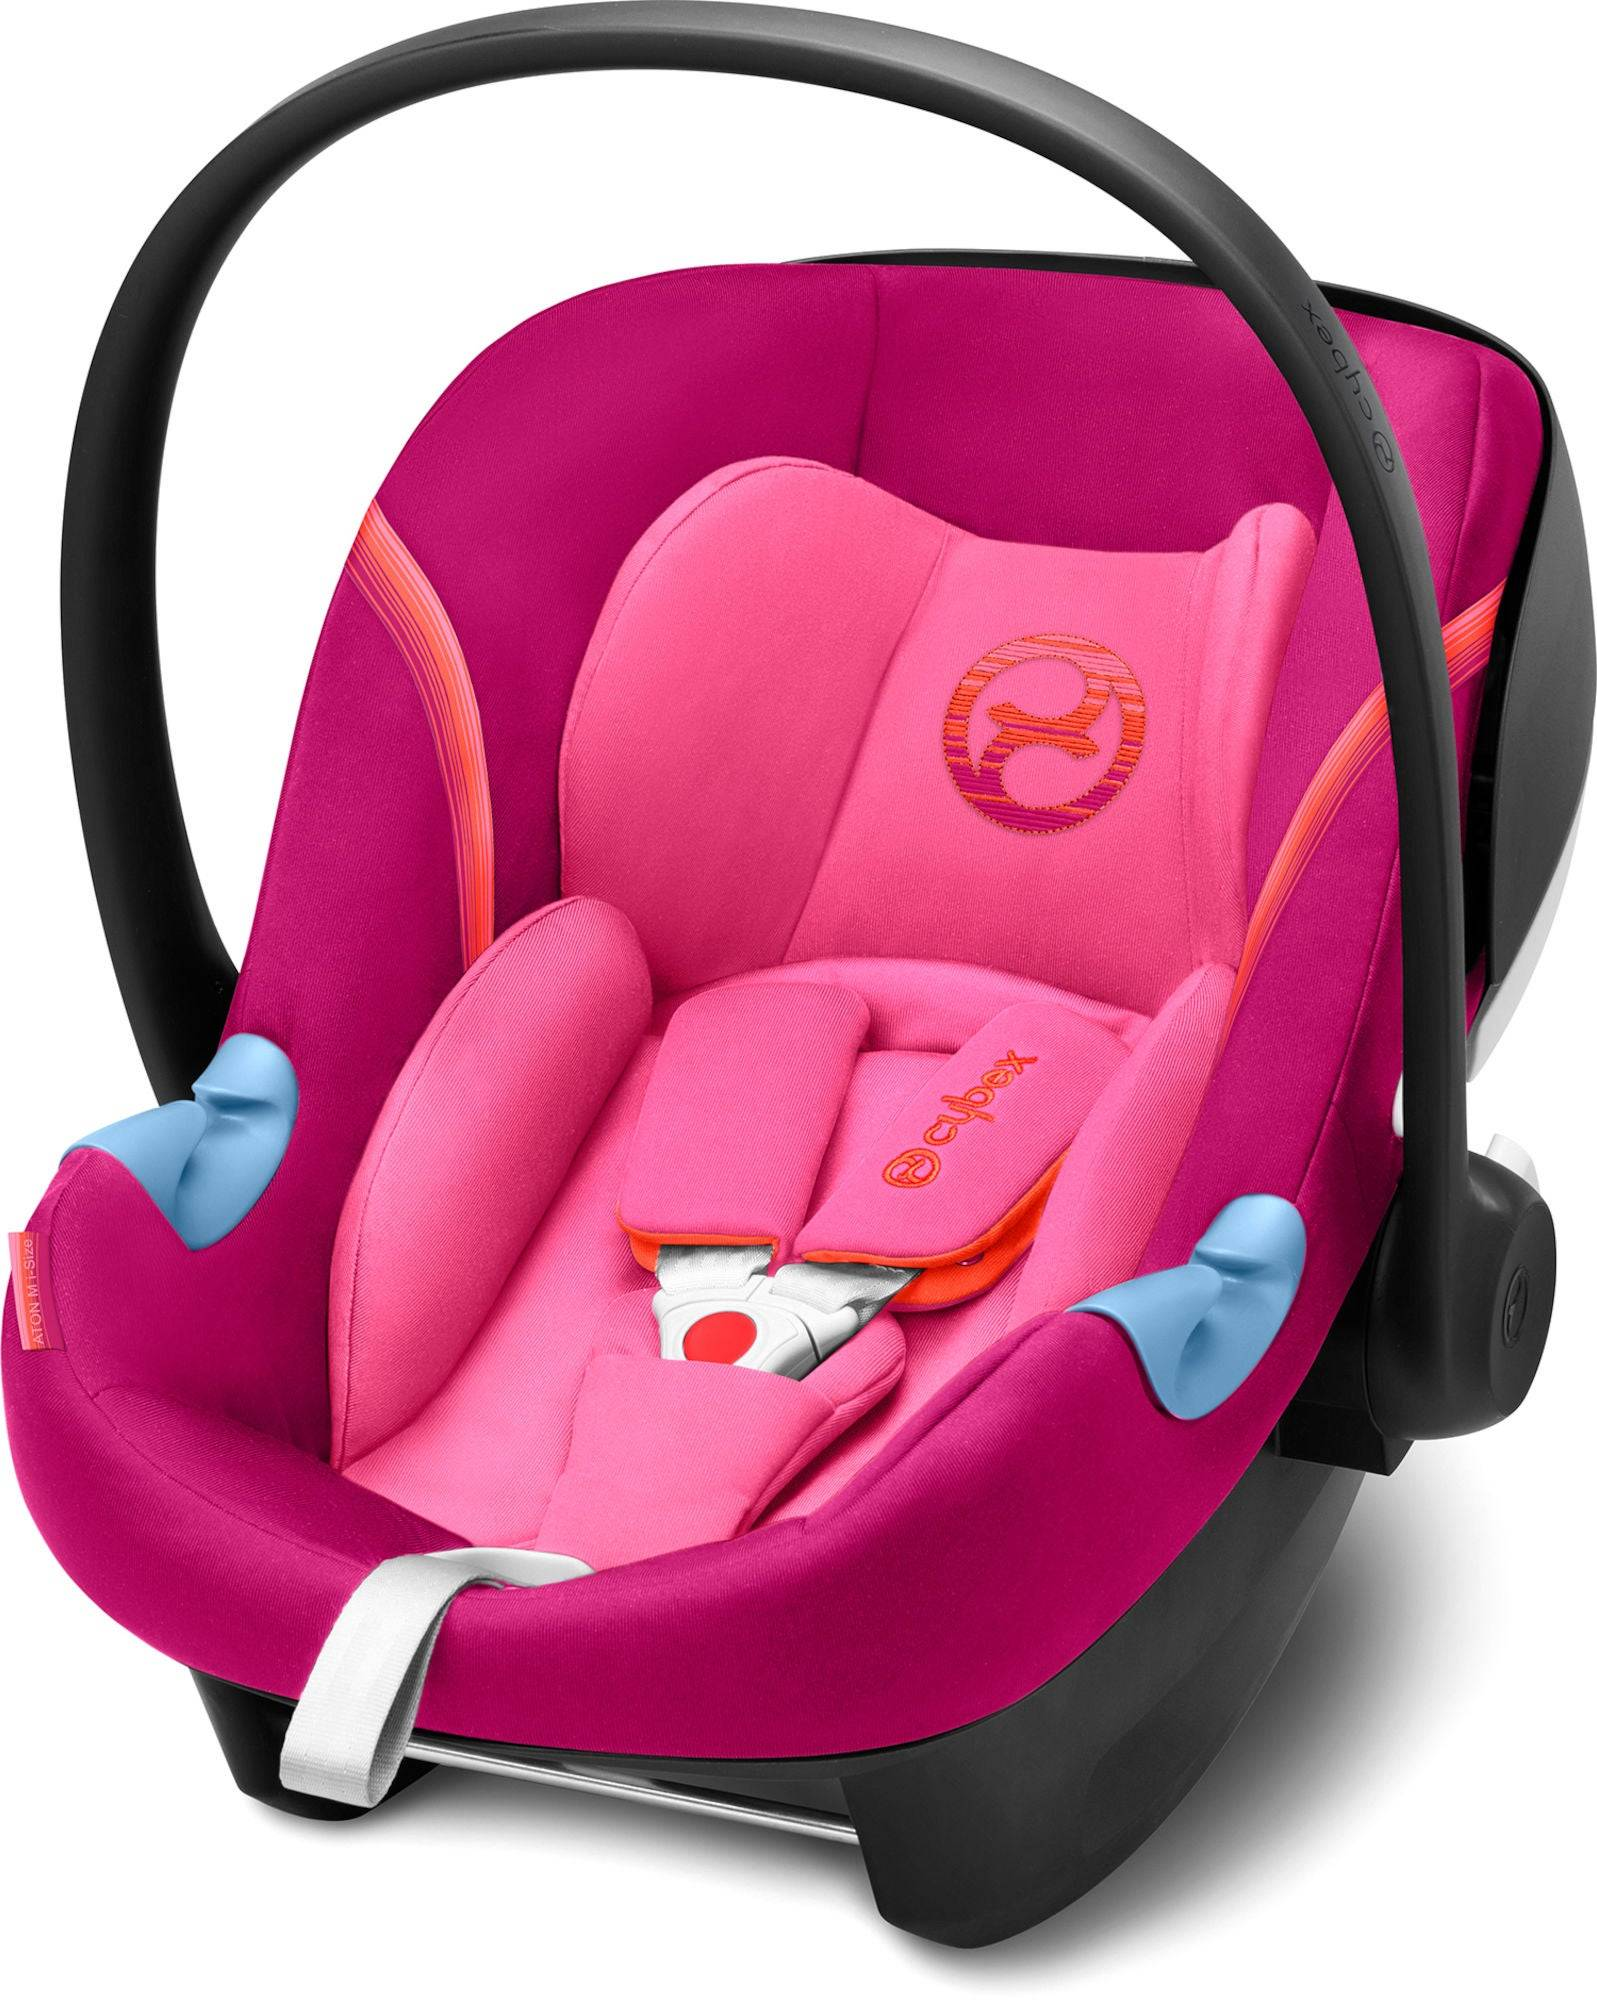 Cybex Aton M i-Size Babyskydd, Passion Pink